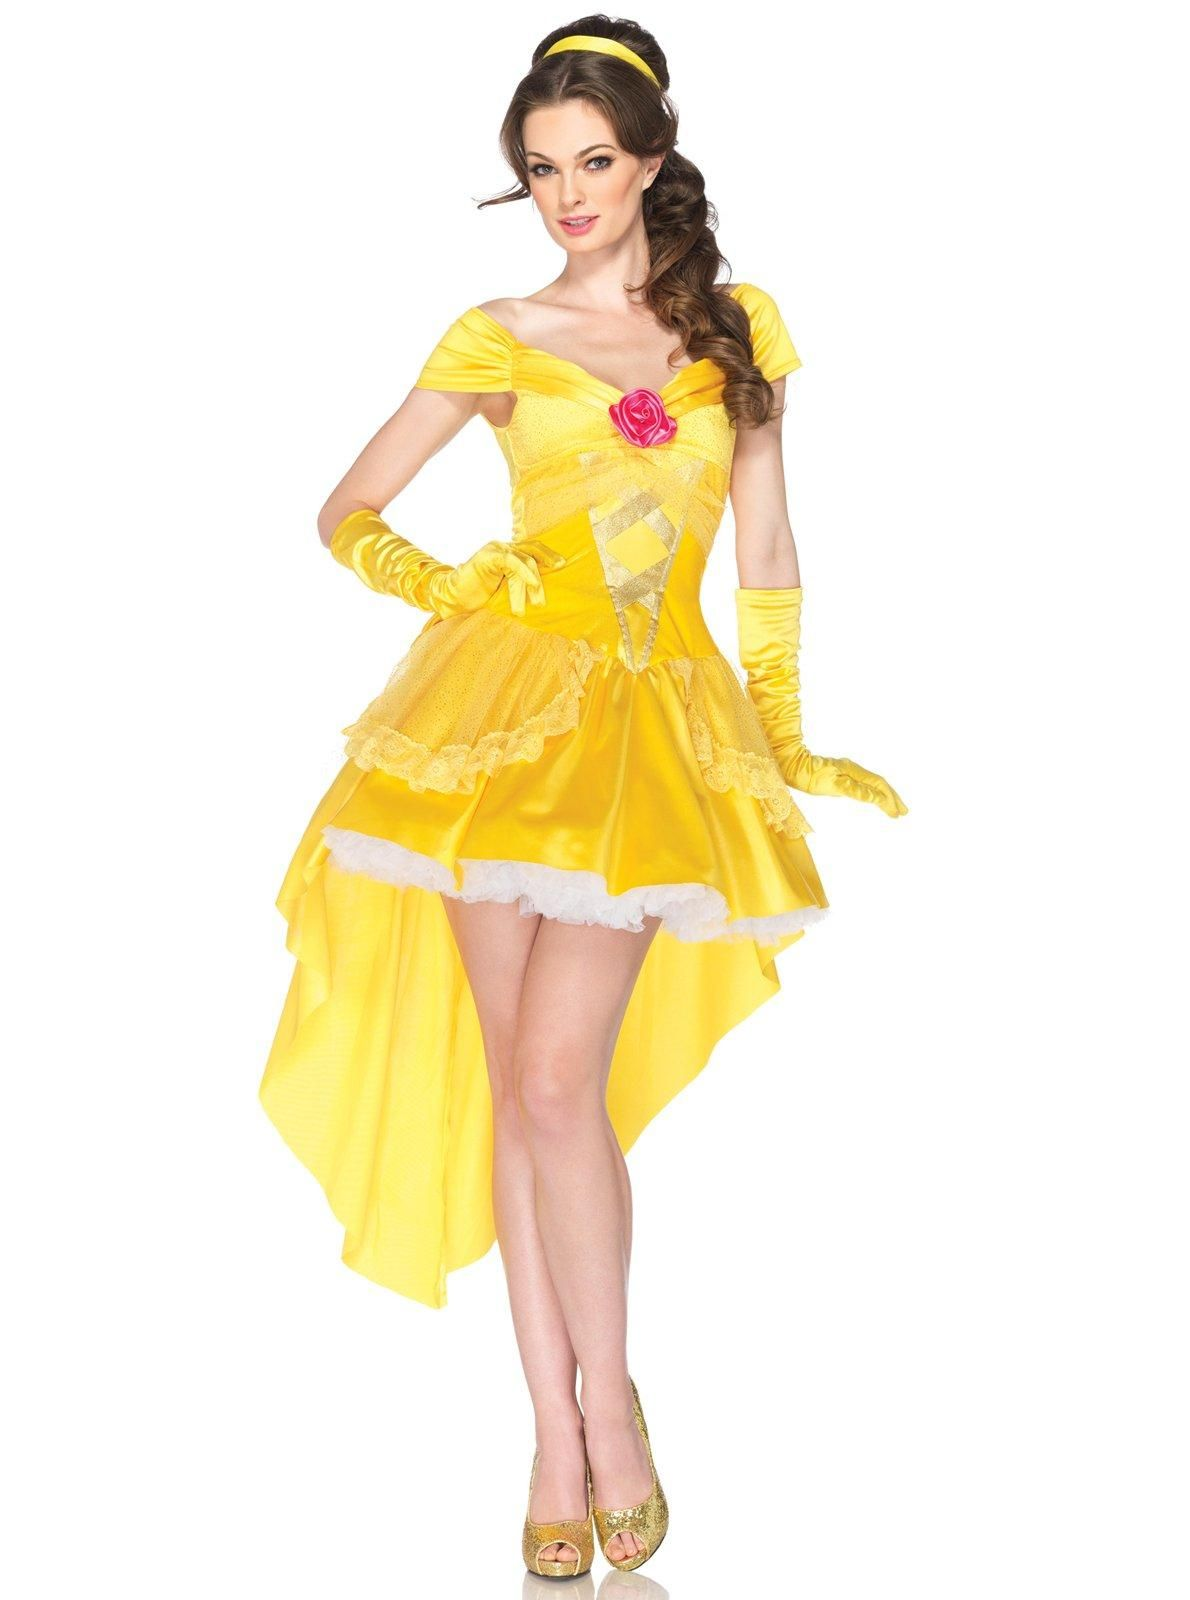 disney princesses costumes adults. Black Bedroom Furniture Sets. Home Design Ideas